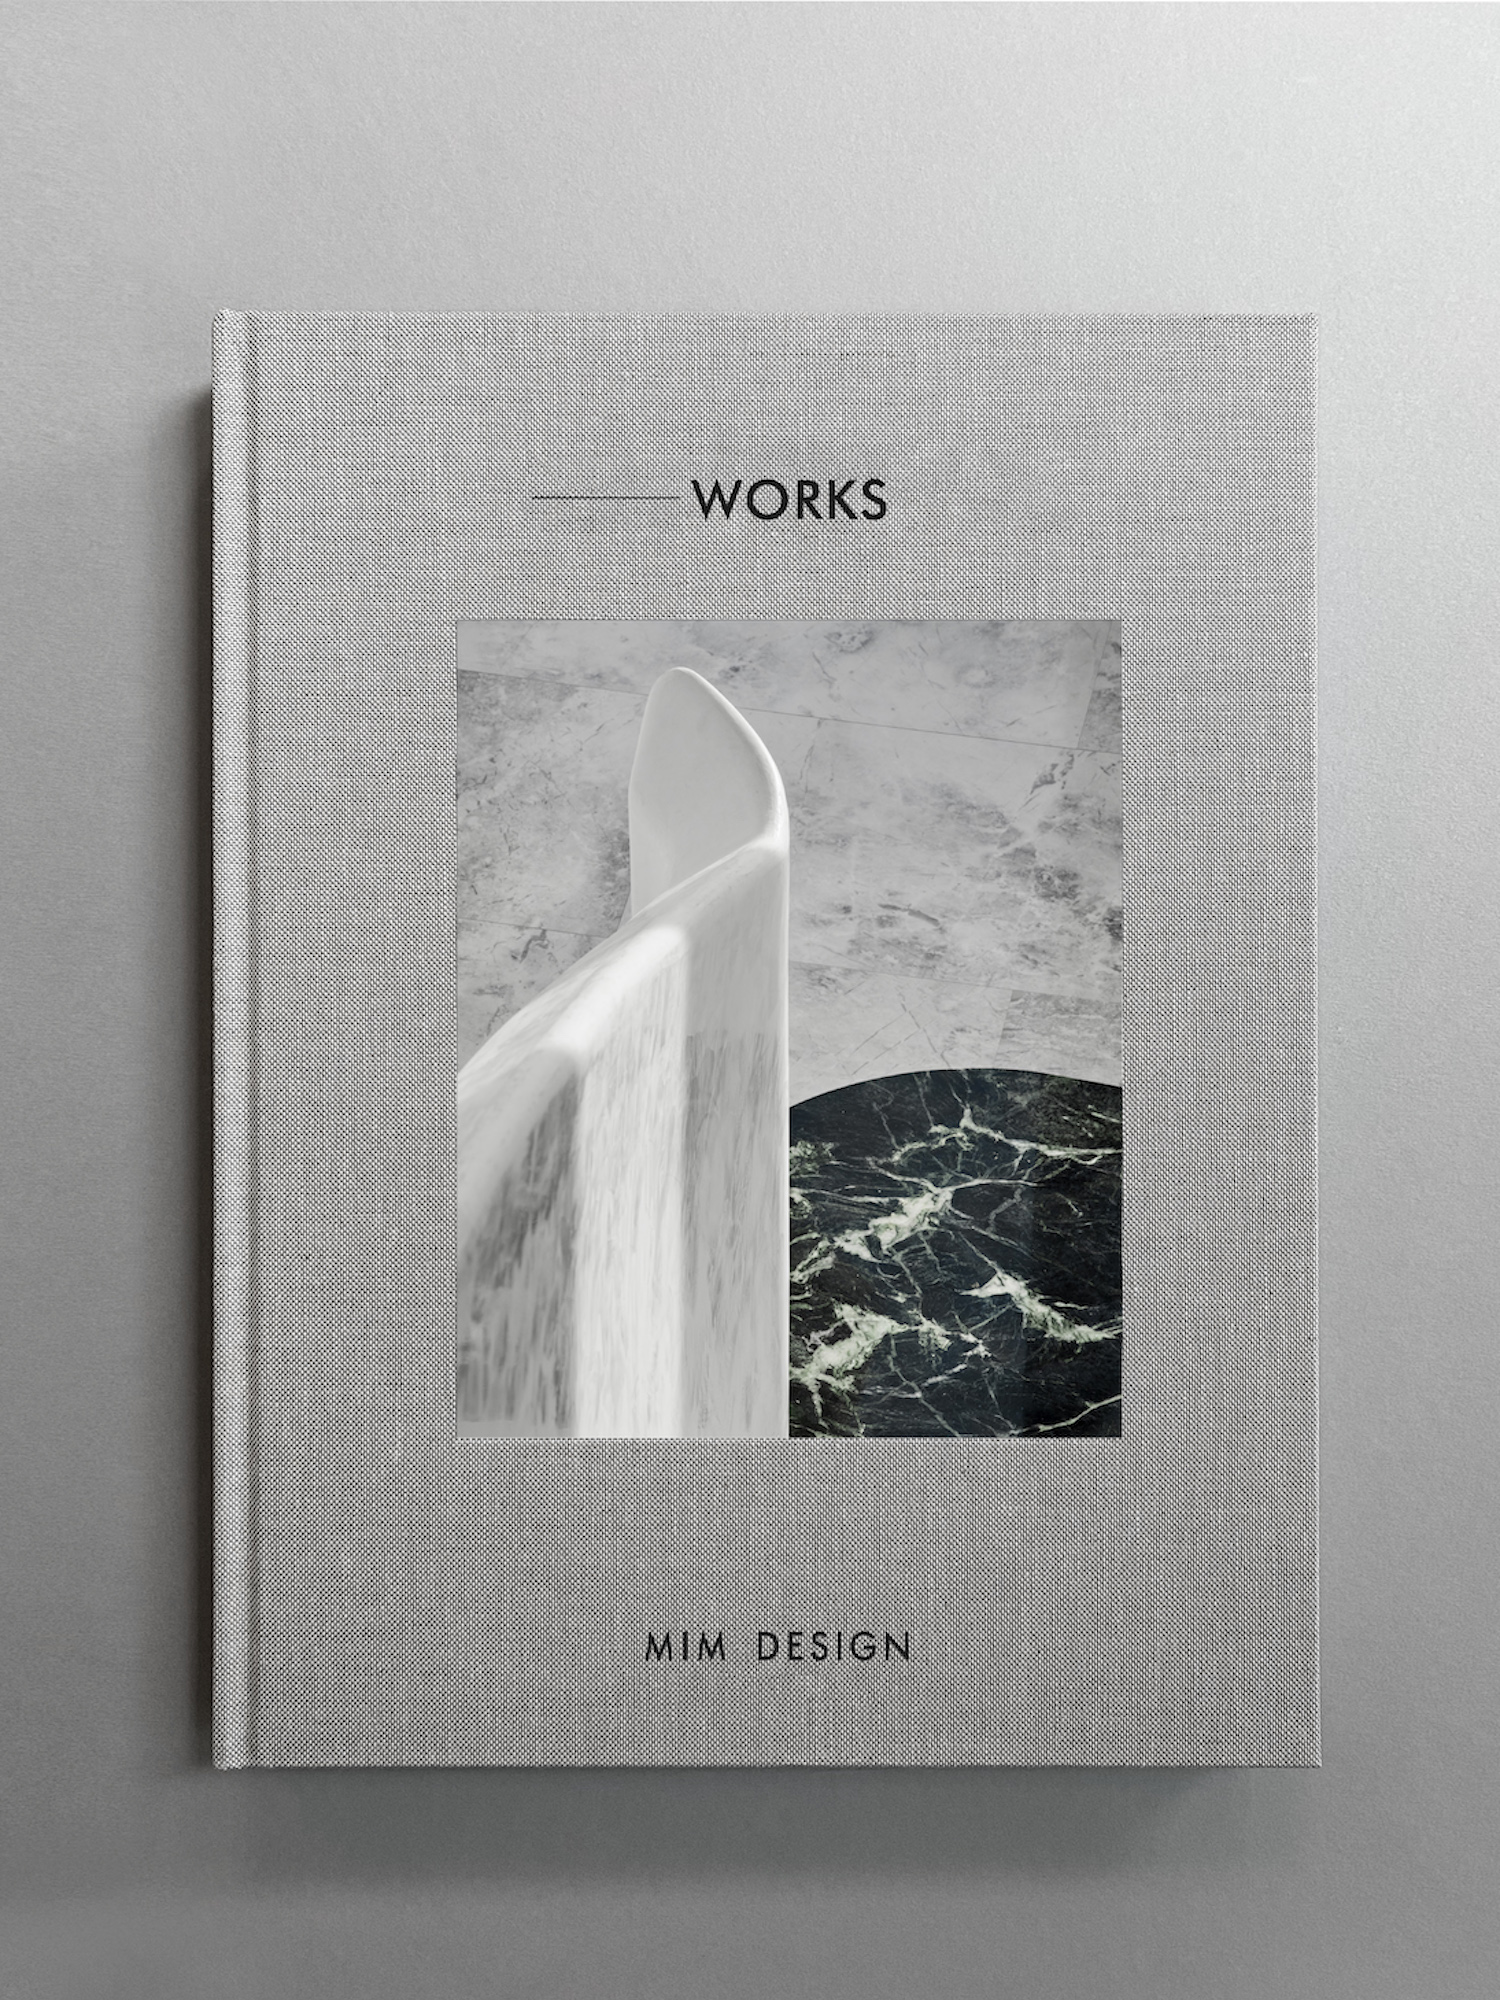 est living works 21 years mim design publication 1